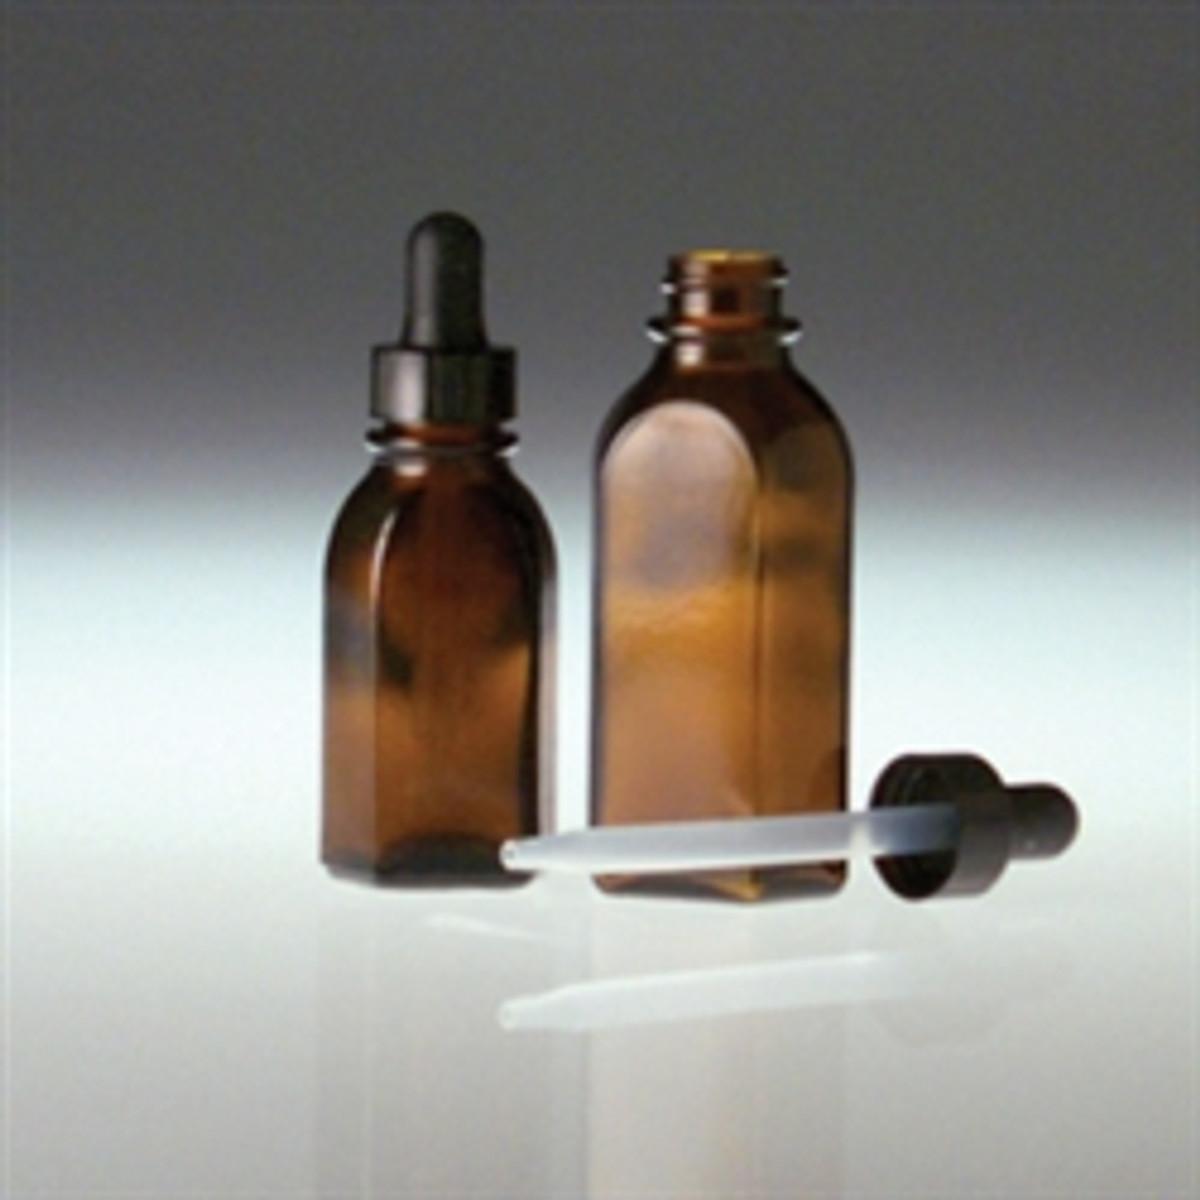 752b3cf33968 Amber Oval Dropper Bottle, 2oz with 20-400 Black PP Cap, 7 x 89mm Plastic  Dropper, case/36